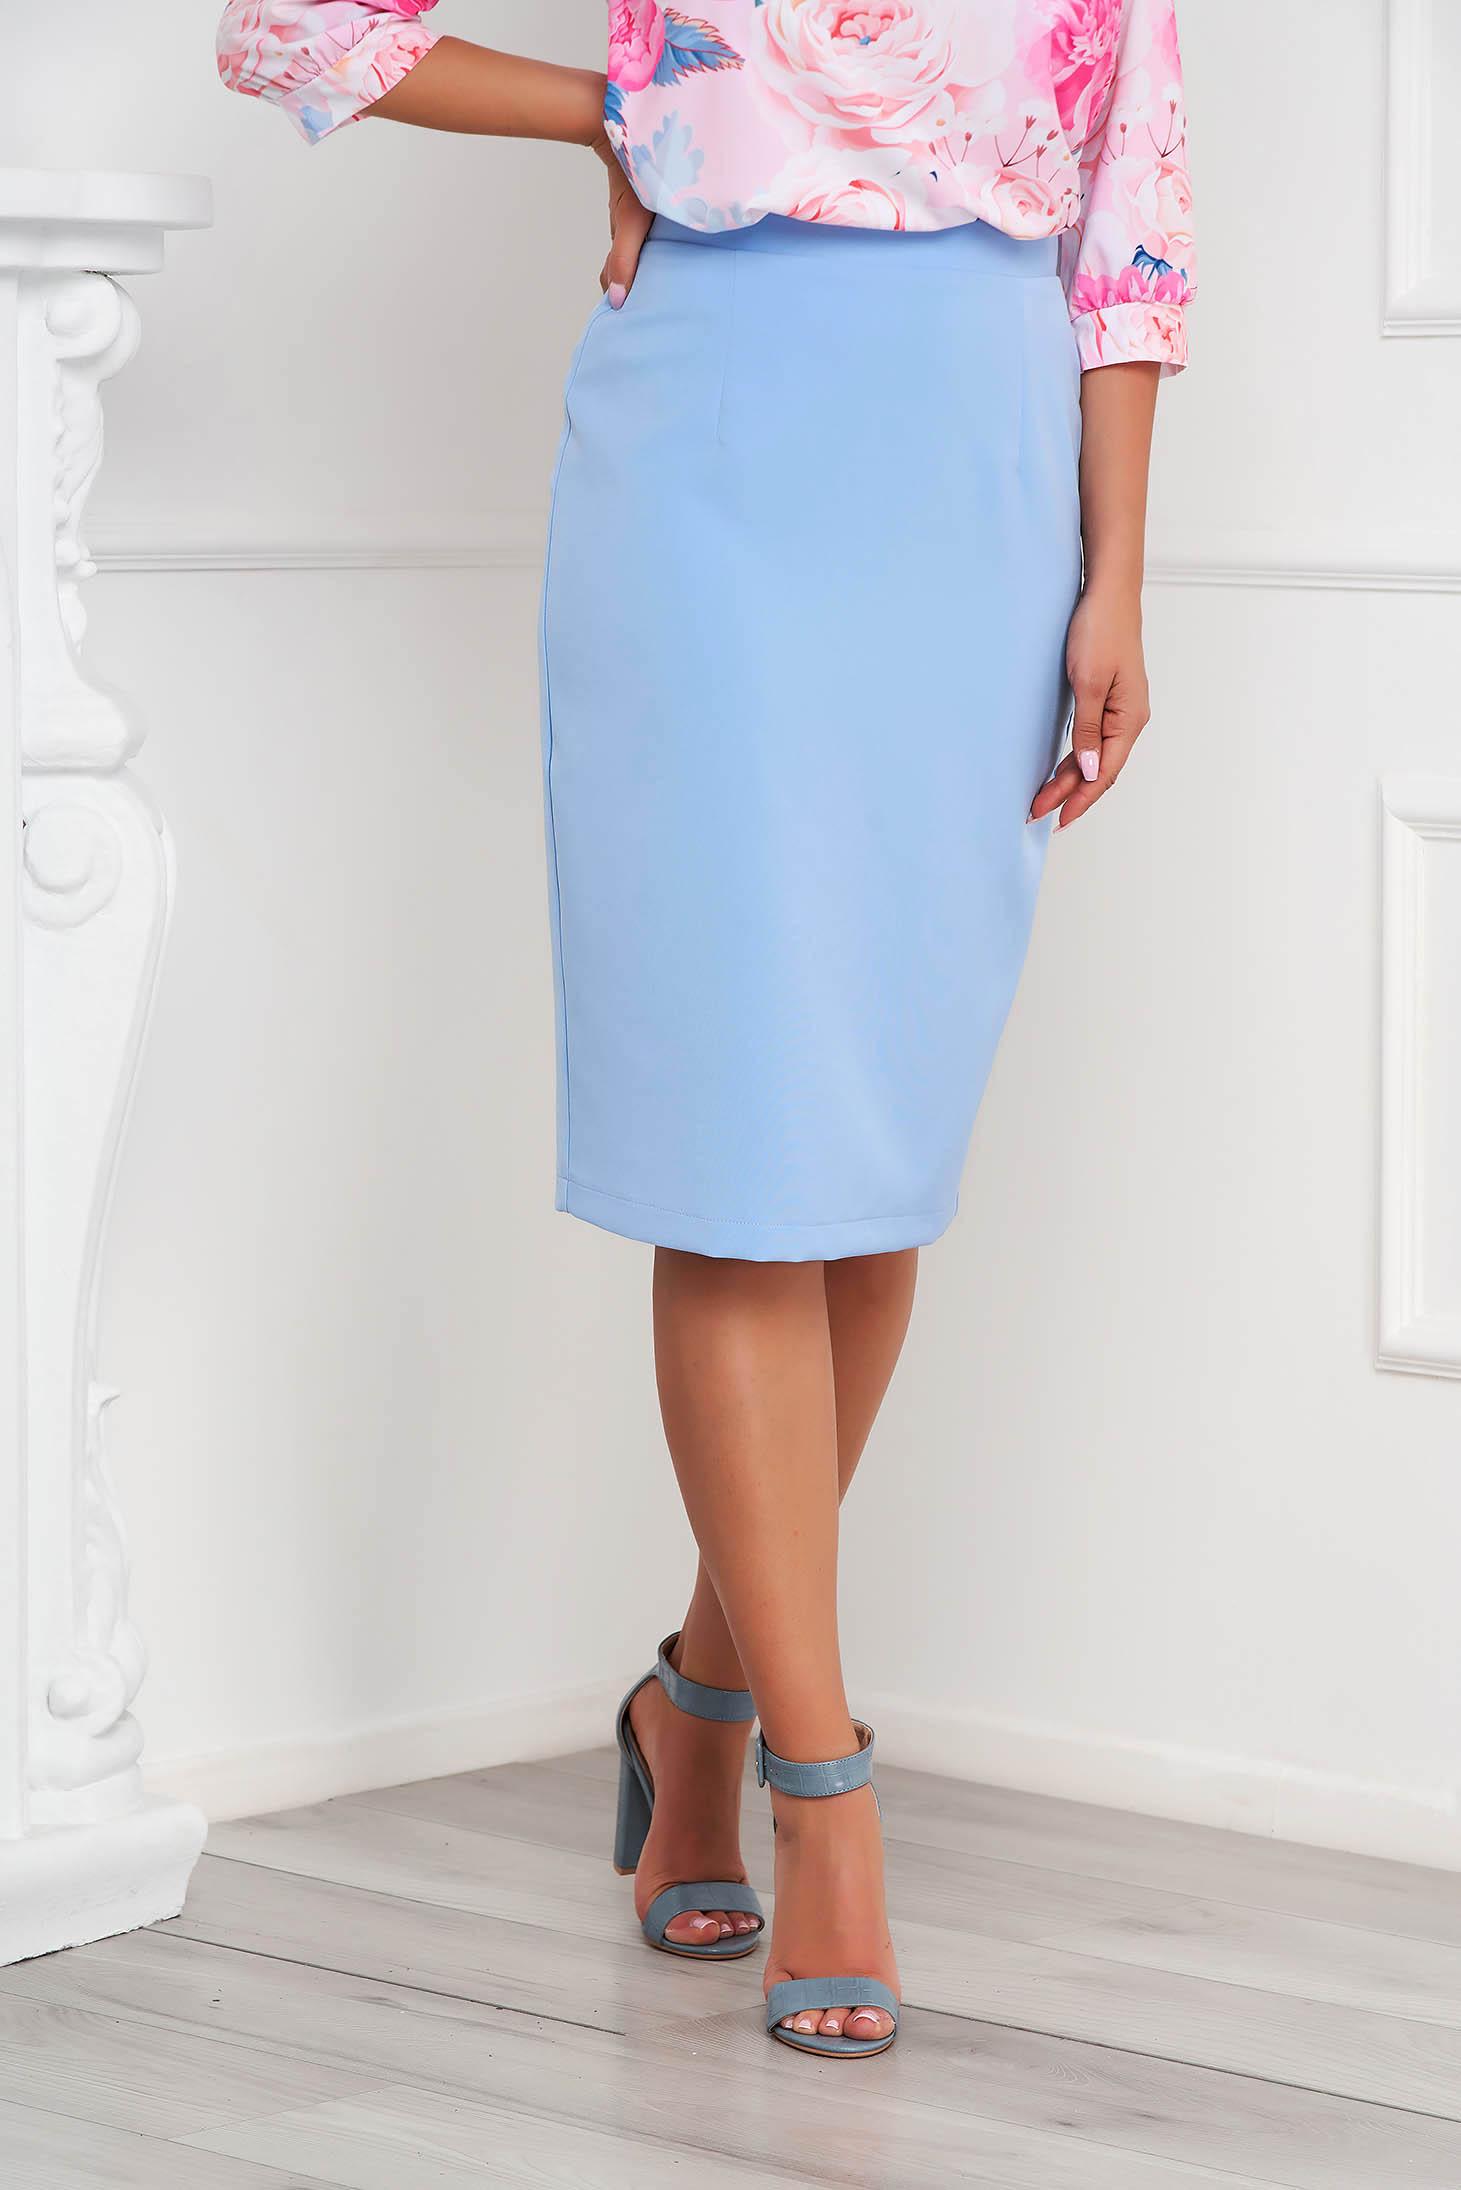 StarShinerS lightblue high waisted skirt office pencil cloth midi from elastic fabric